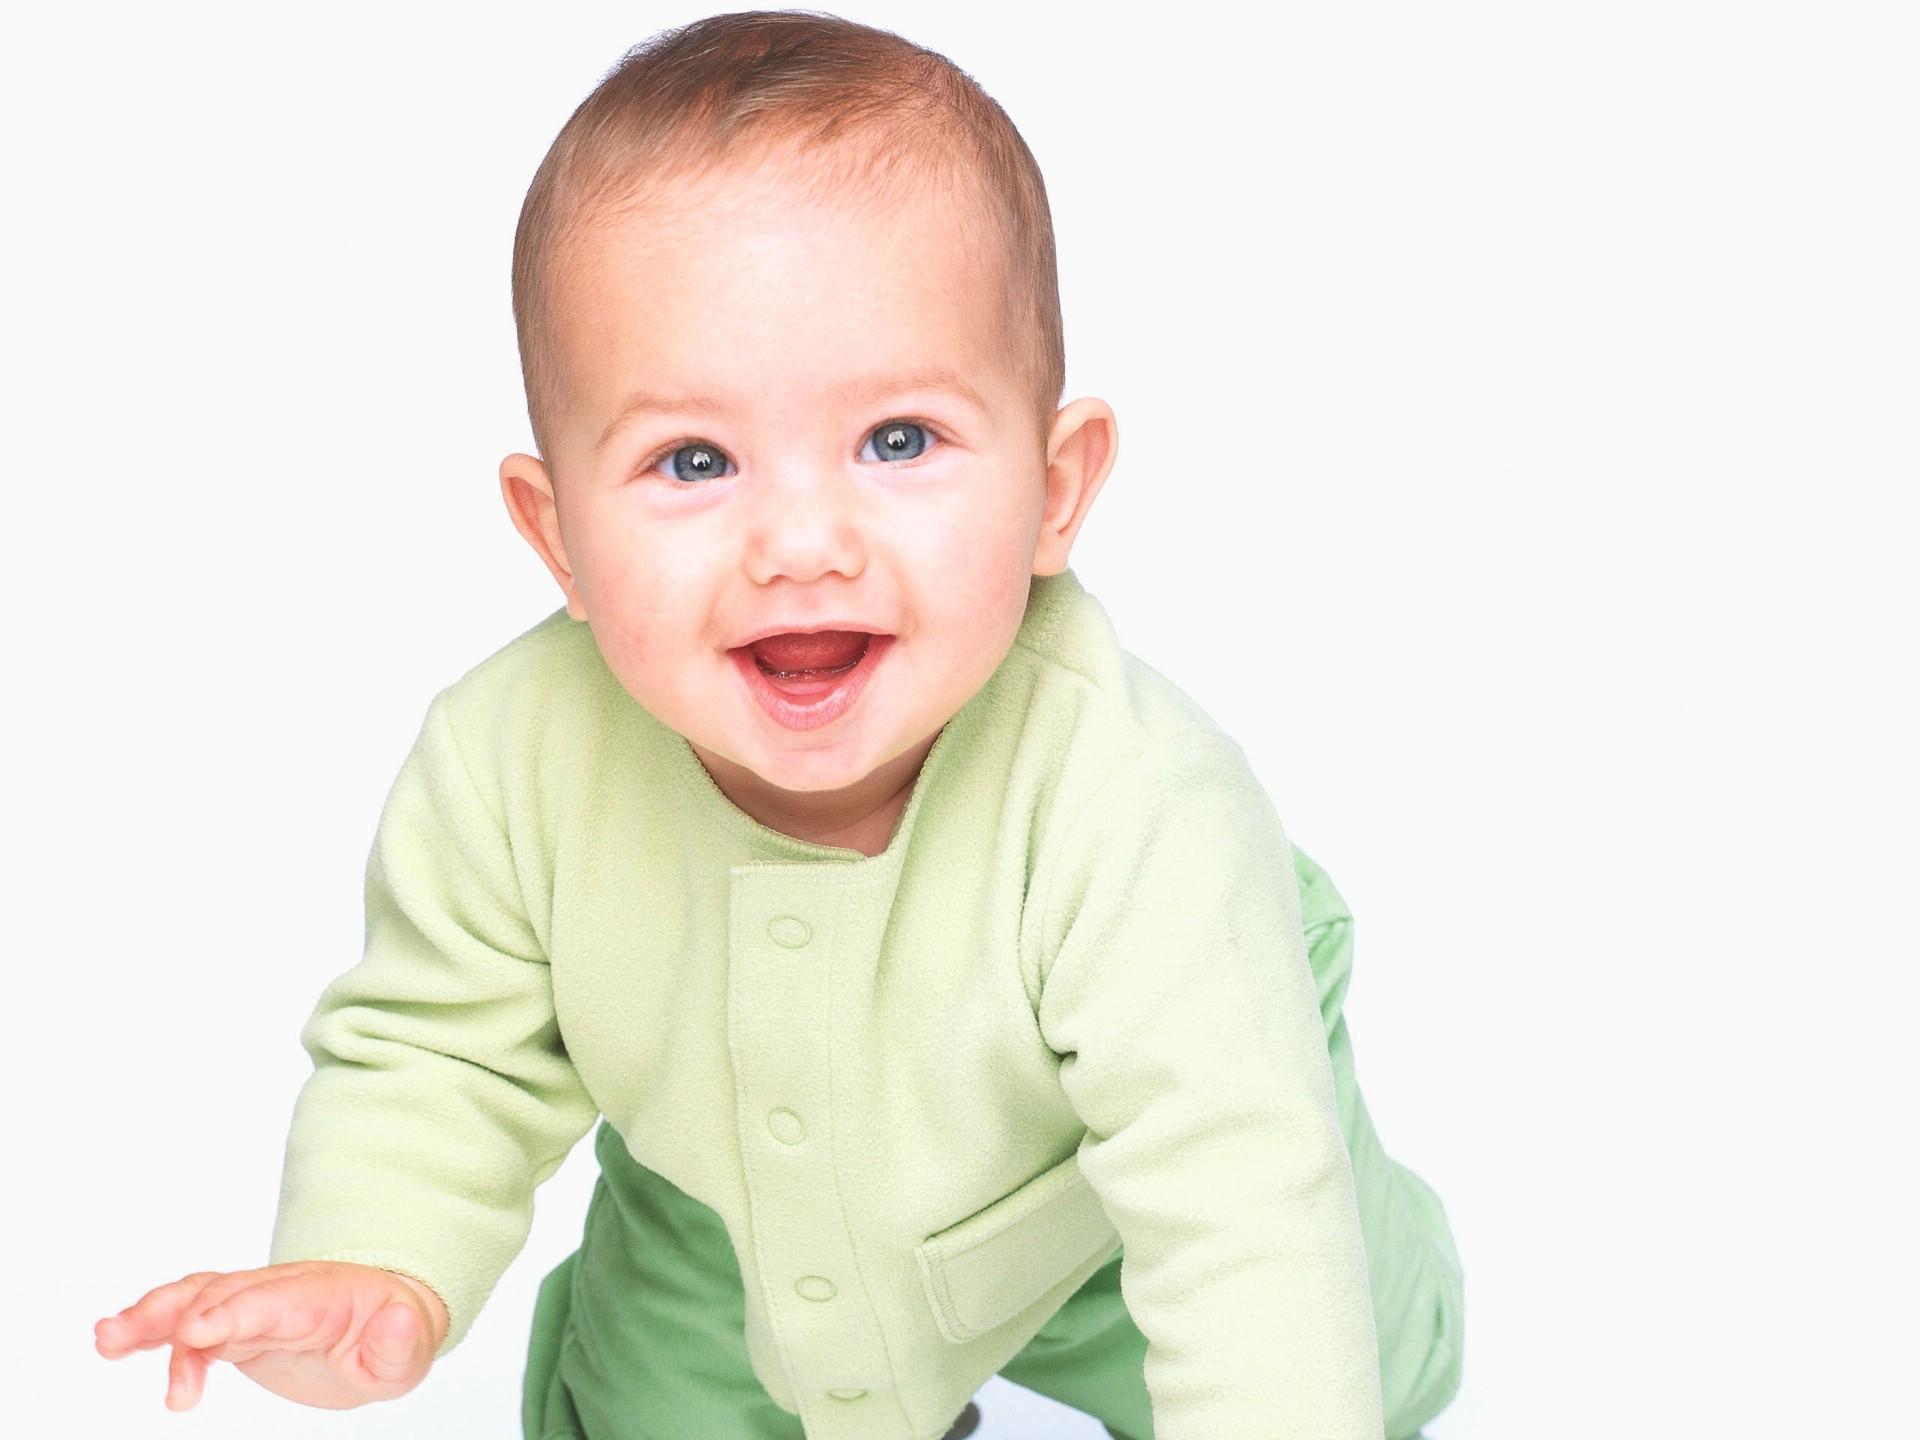 Cute Kids Babies HD 6 Wallpapers HD Wallpapers 1920x1440